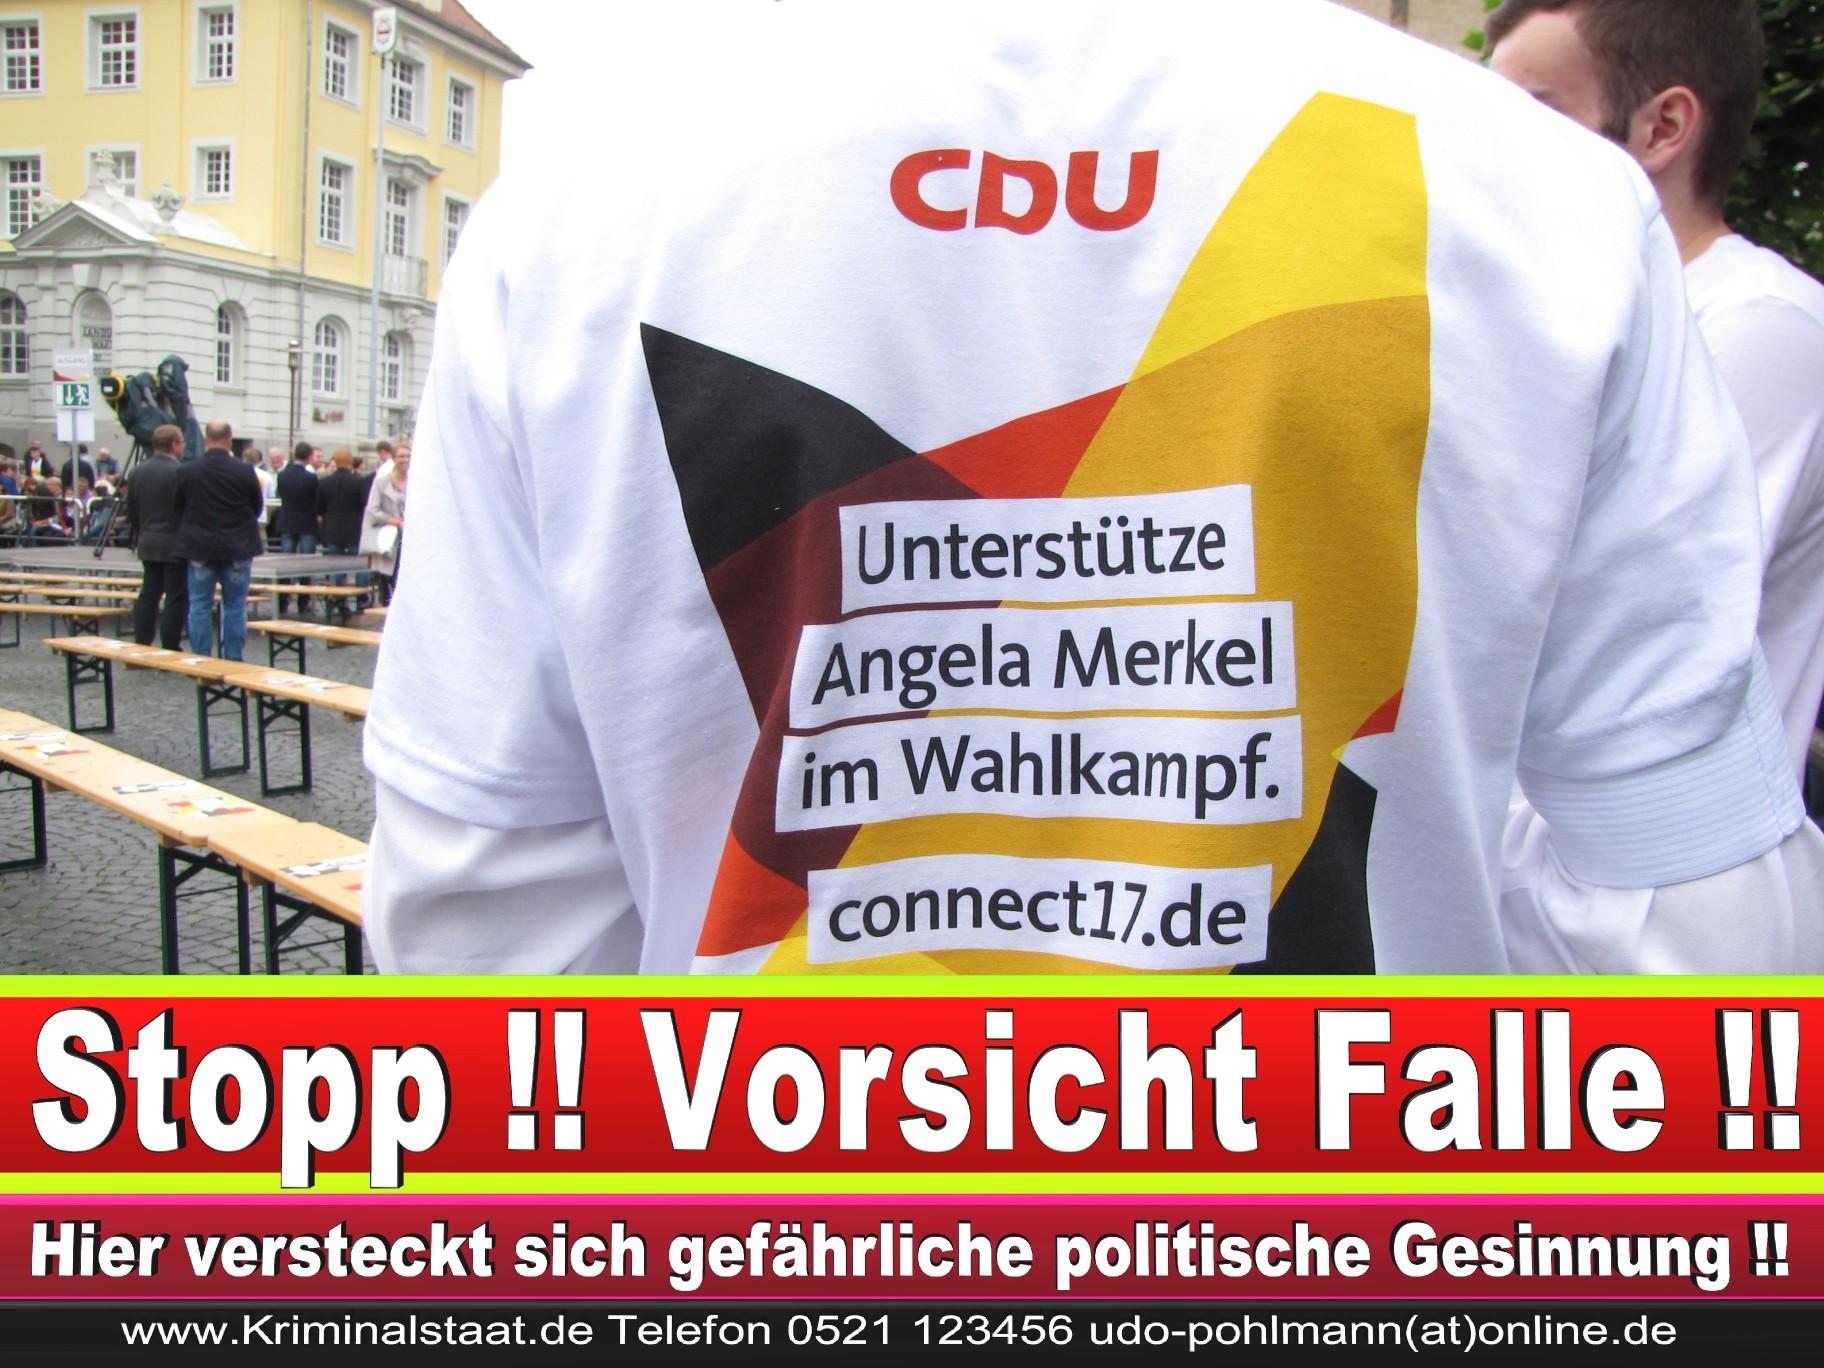 CDU HERFORD Kurruption Betrug Kinderpornografie Kinderpornos 16